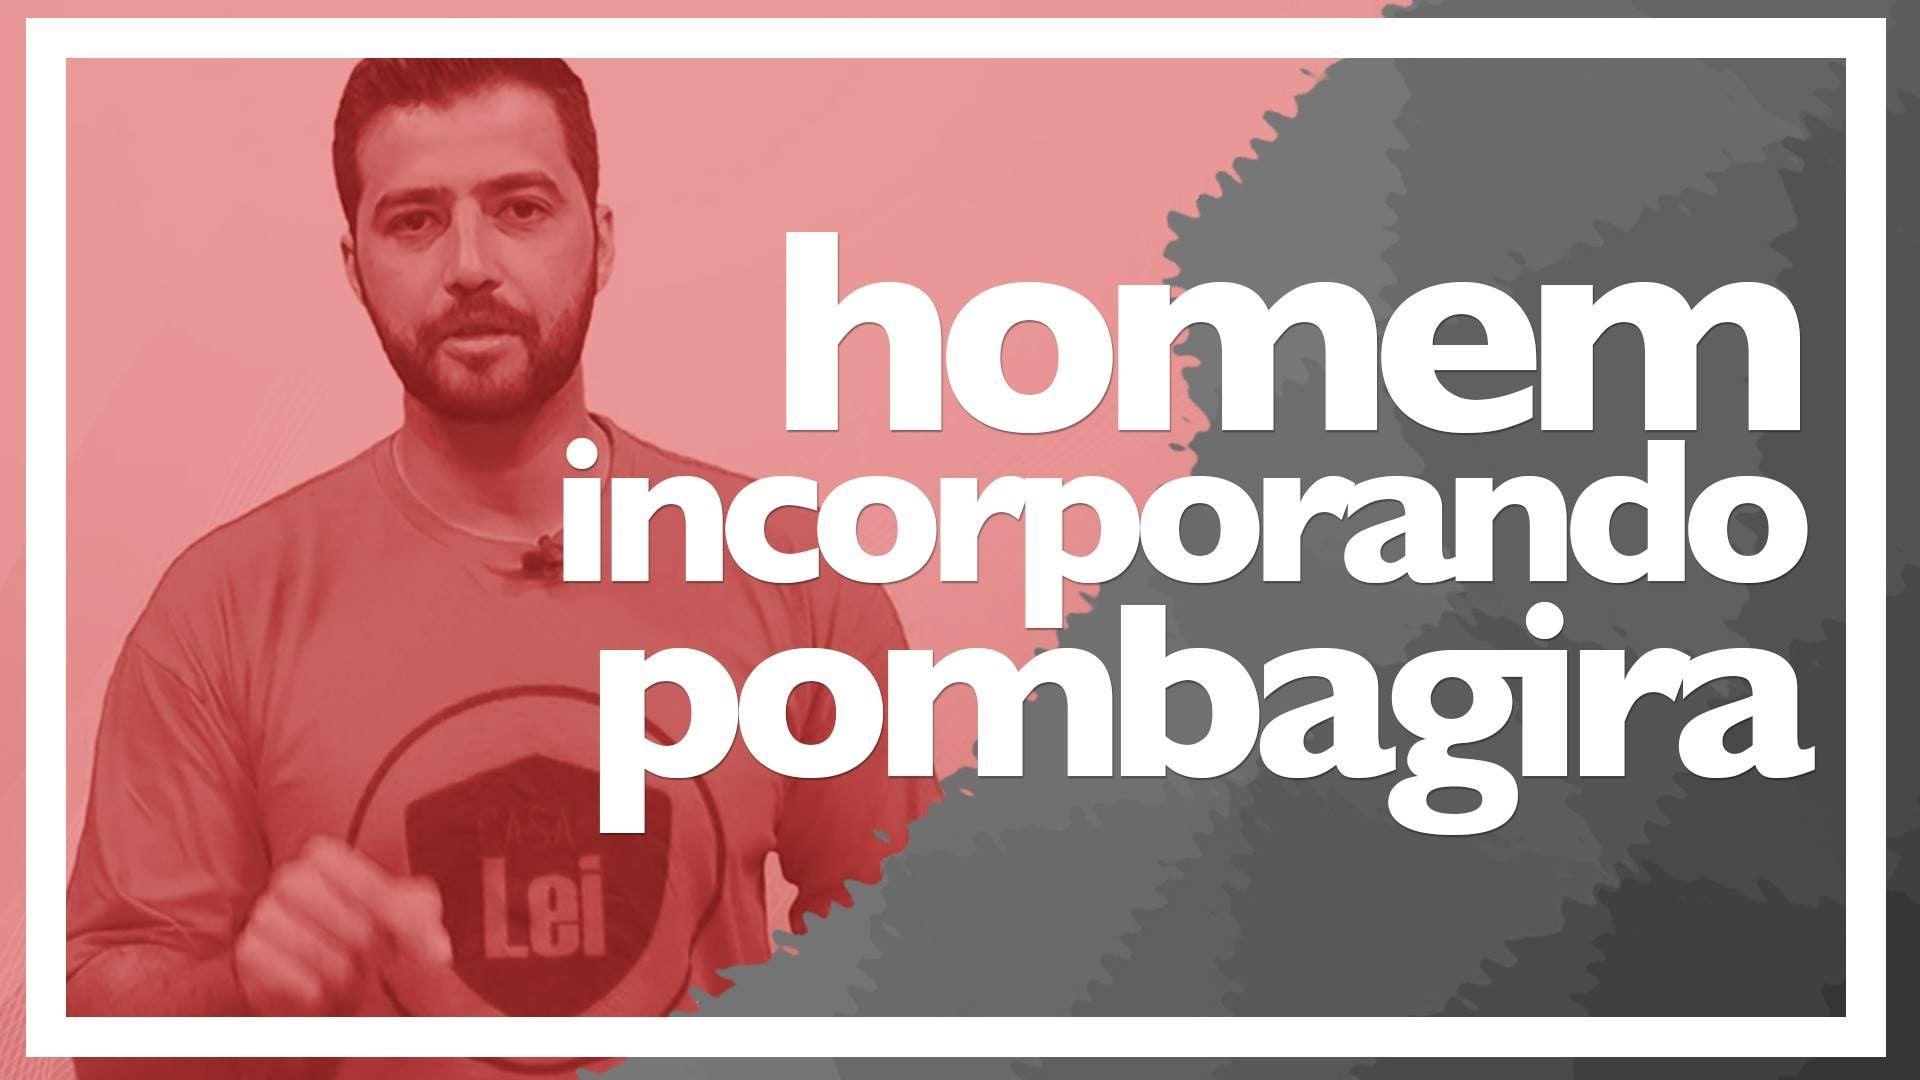 HOMEM INCORPORANDO POMBAGIRA